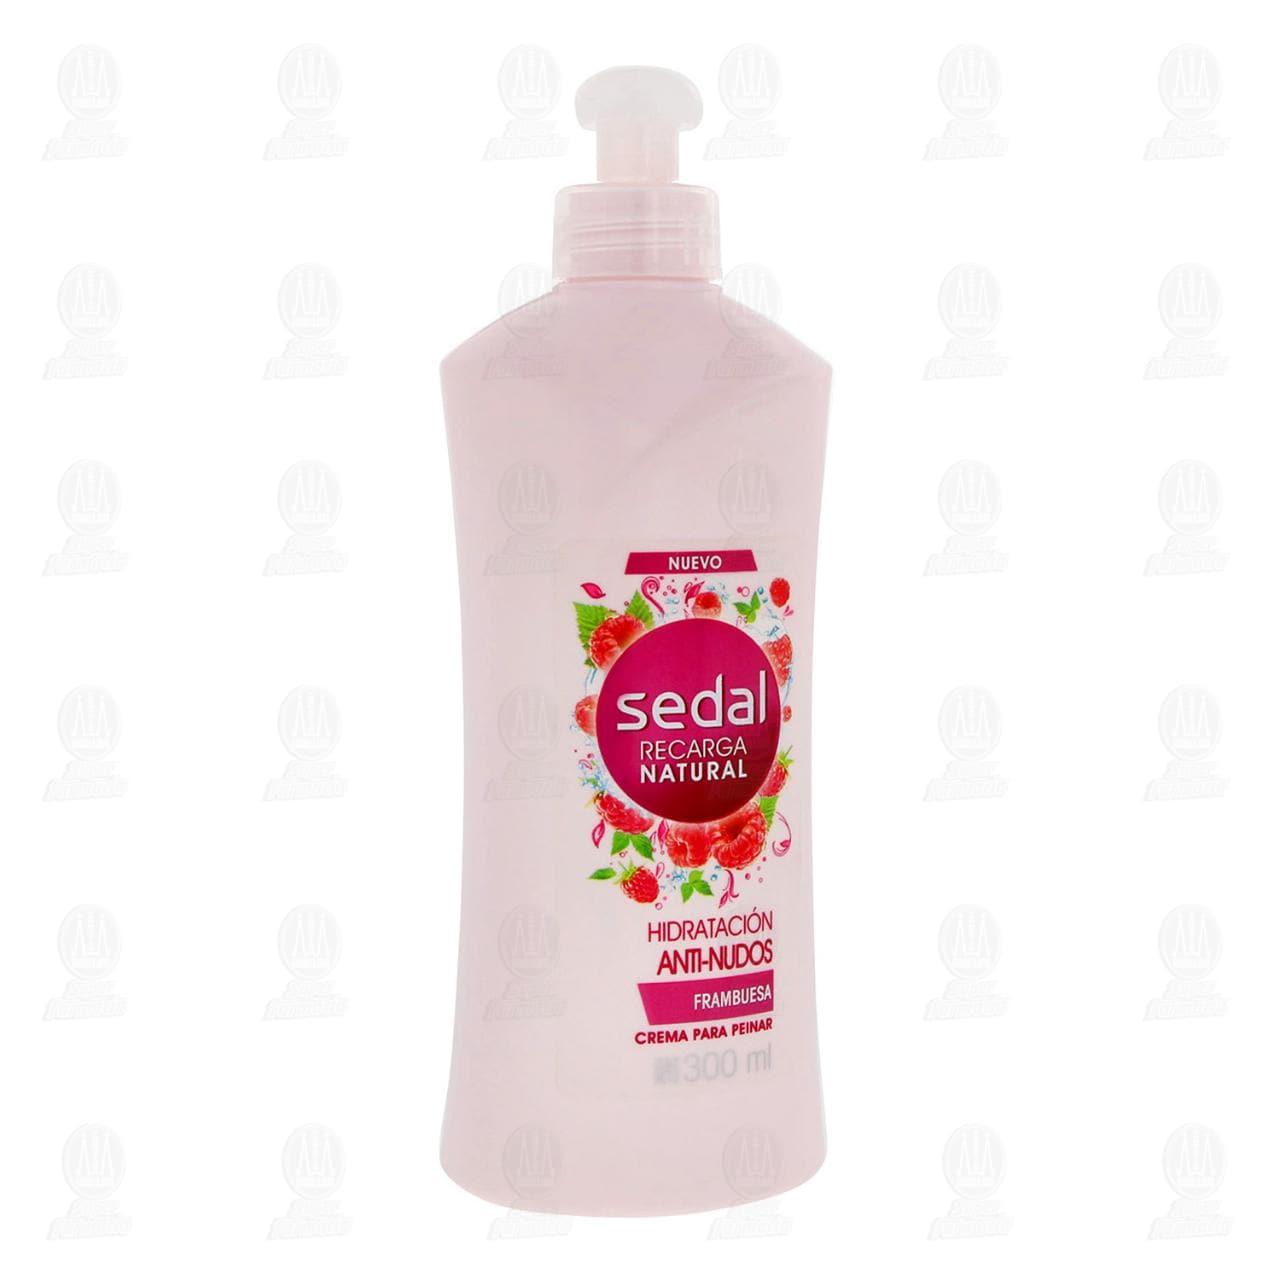 Comprar Crema para Peinar Sedal Recarga Natural Hidratación Anti-Nudos, 300 ml. en Farmacias Guadalajara